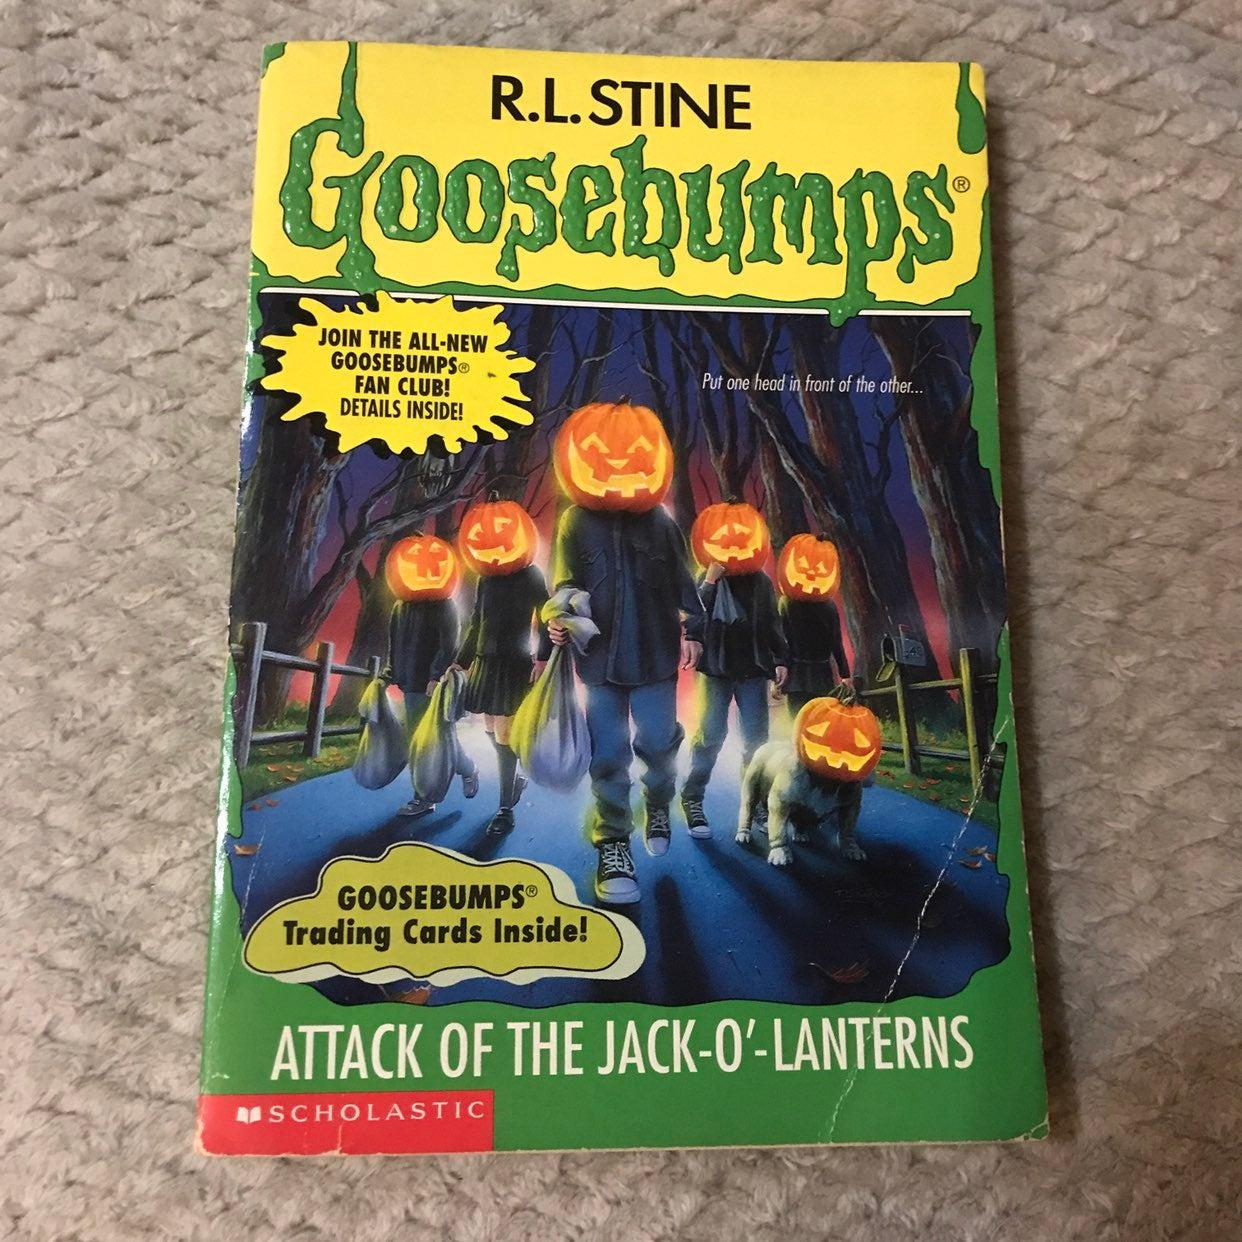 RL Stine Goosebumps #48 Book